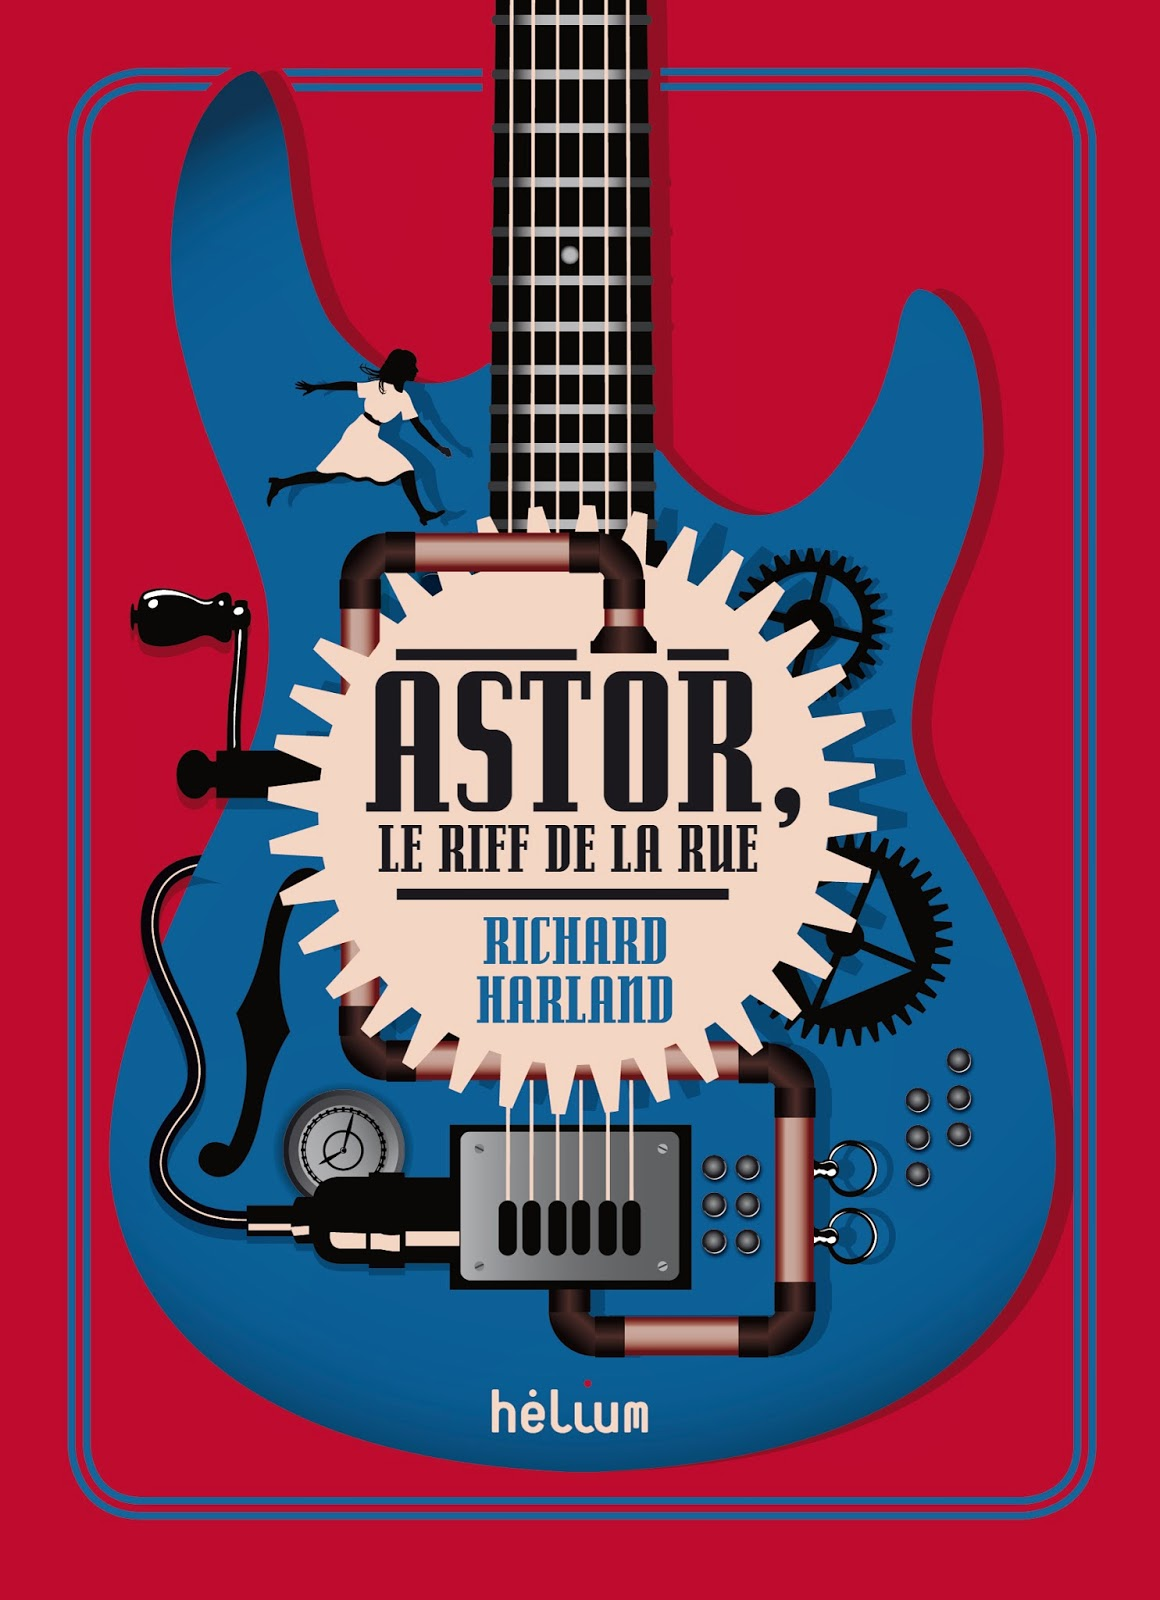 Astor, le riff de la rue